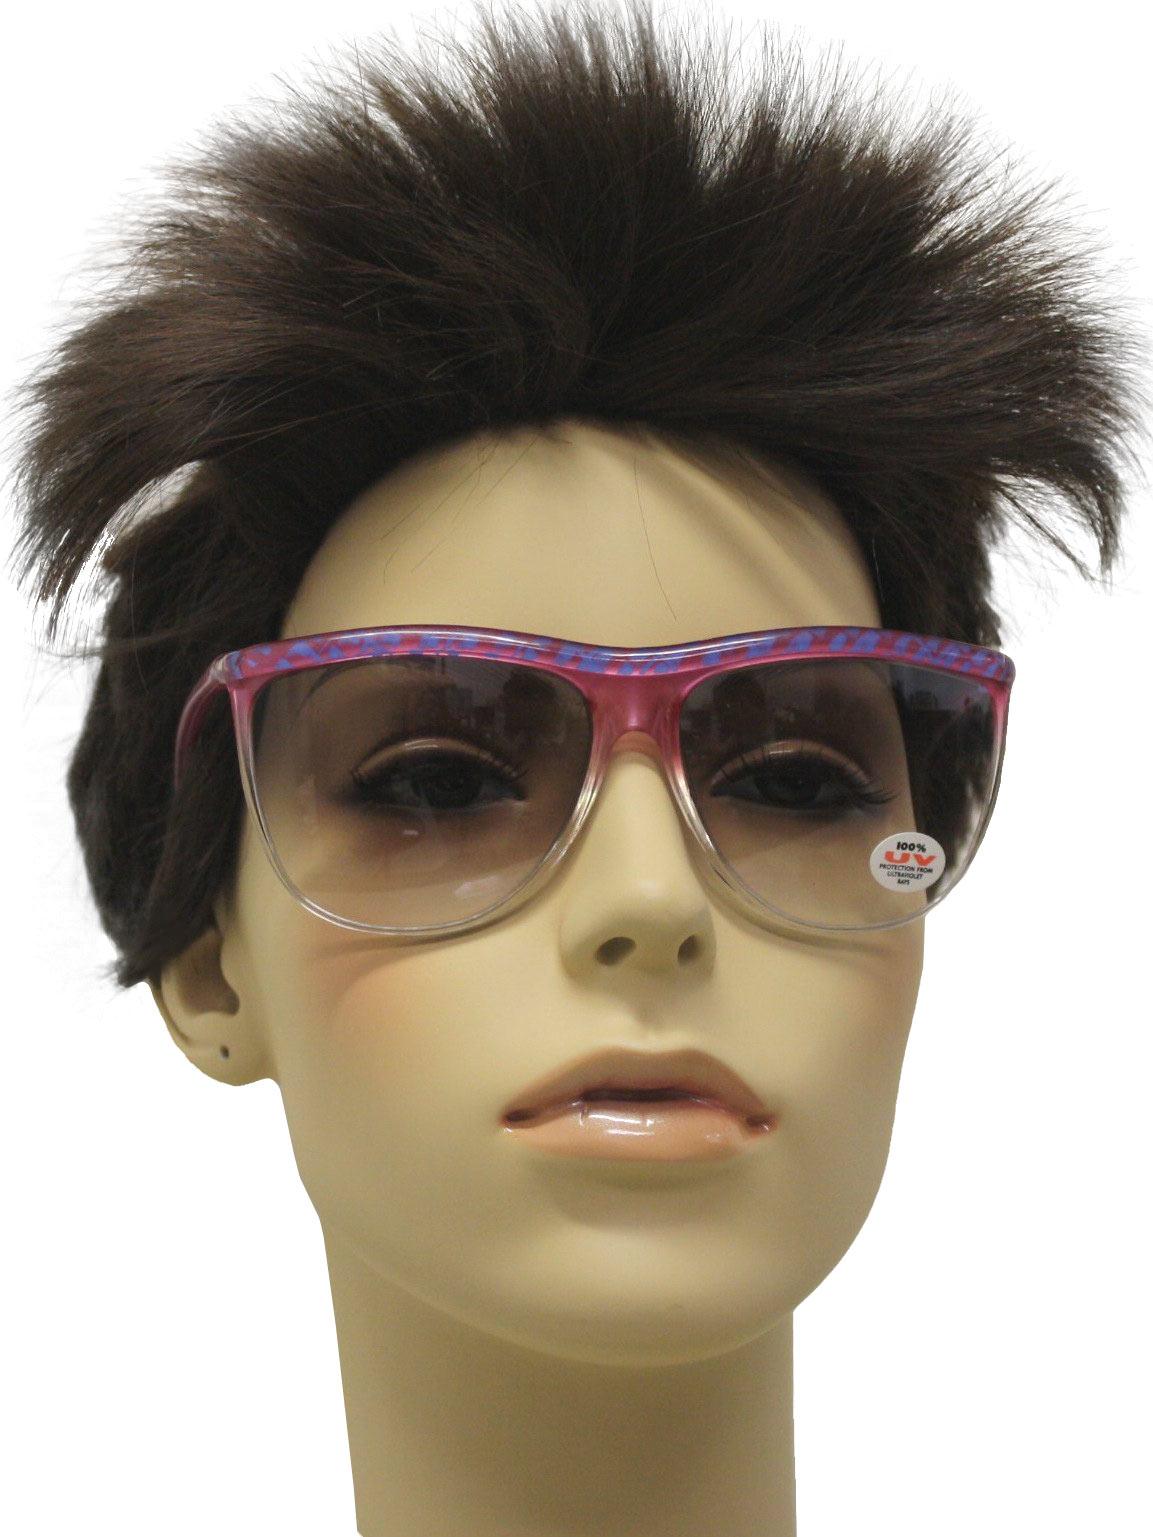 Ugly Fashion Fads | newhairstylesformen2014.com - photo #37